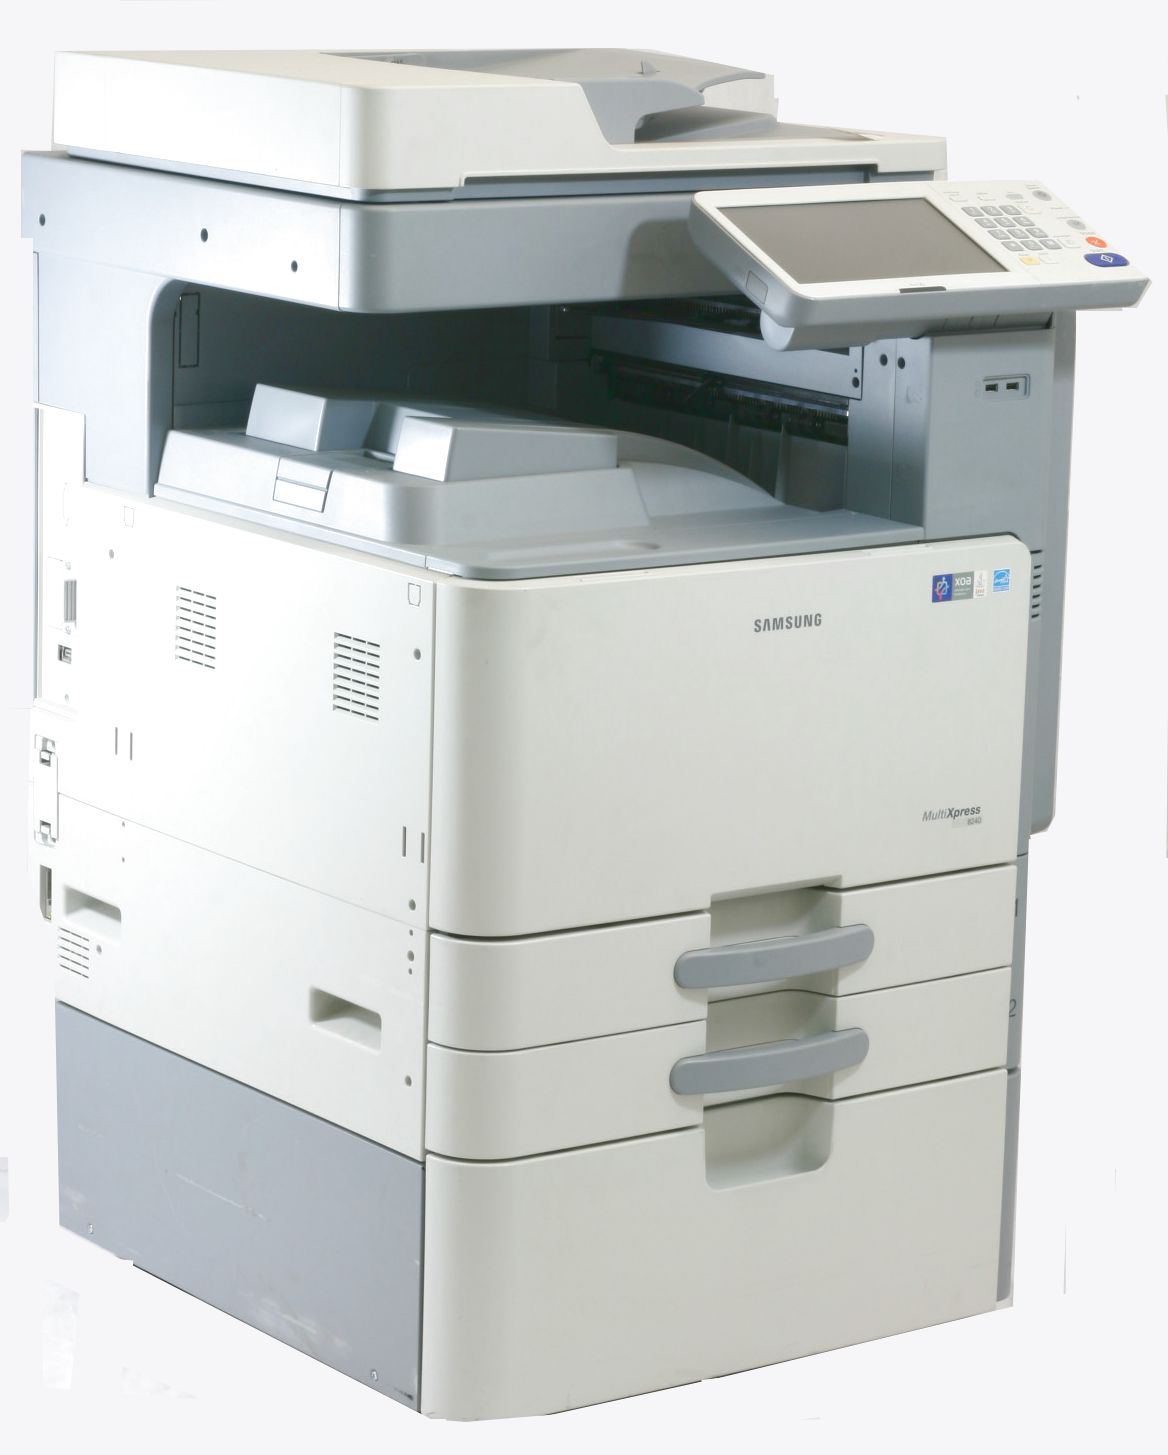 Samsung MultiXpress SCX-8240 Drucker DIN A3 Kopierer Scanner Fax gebraucht